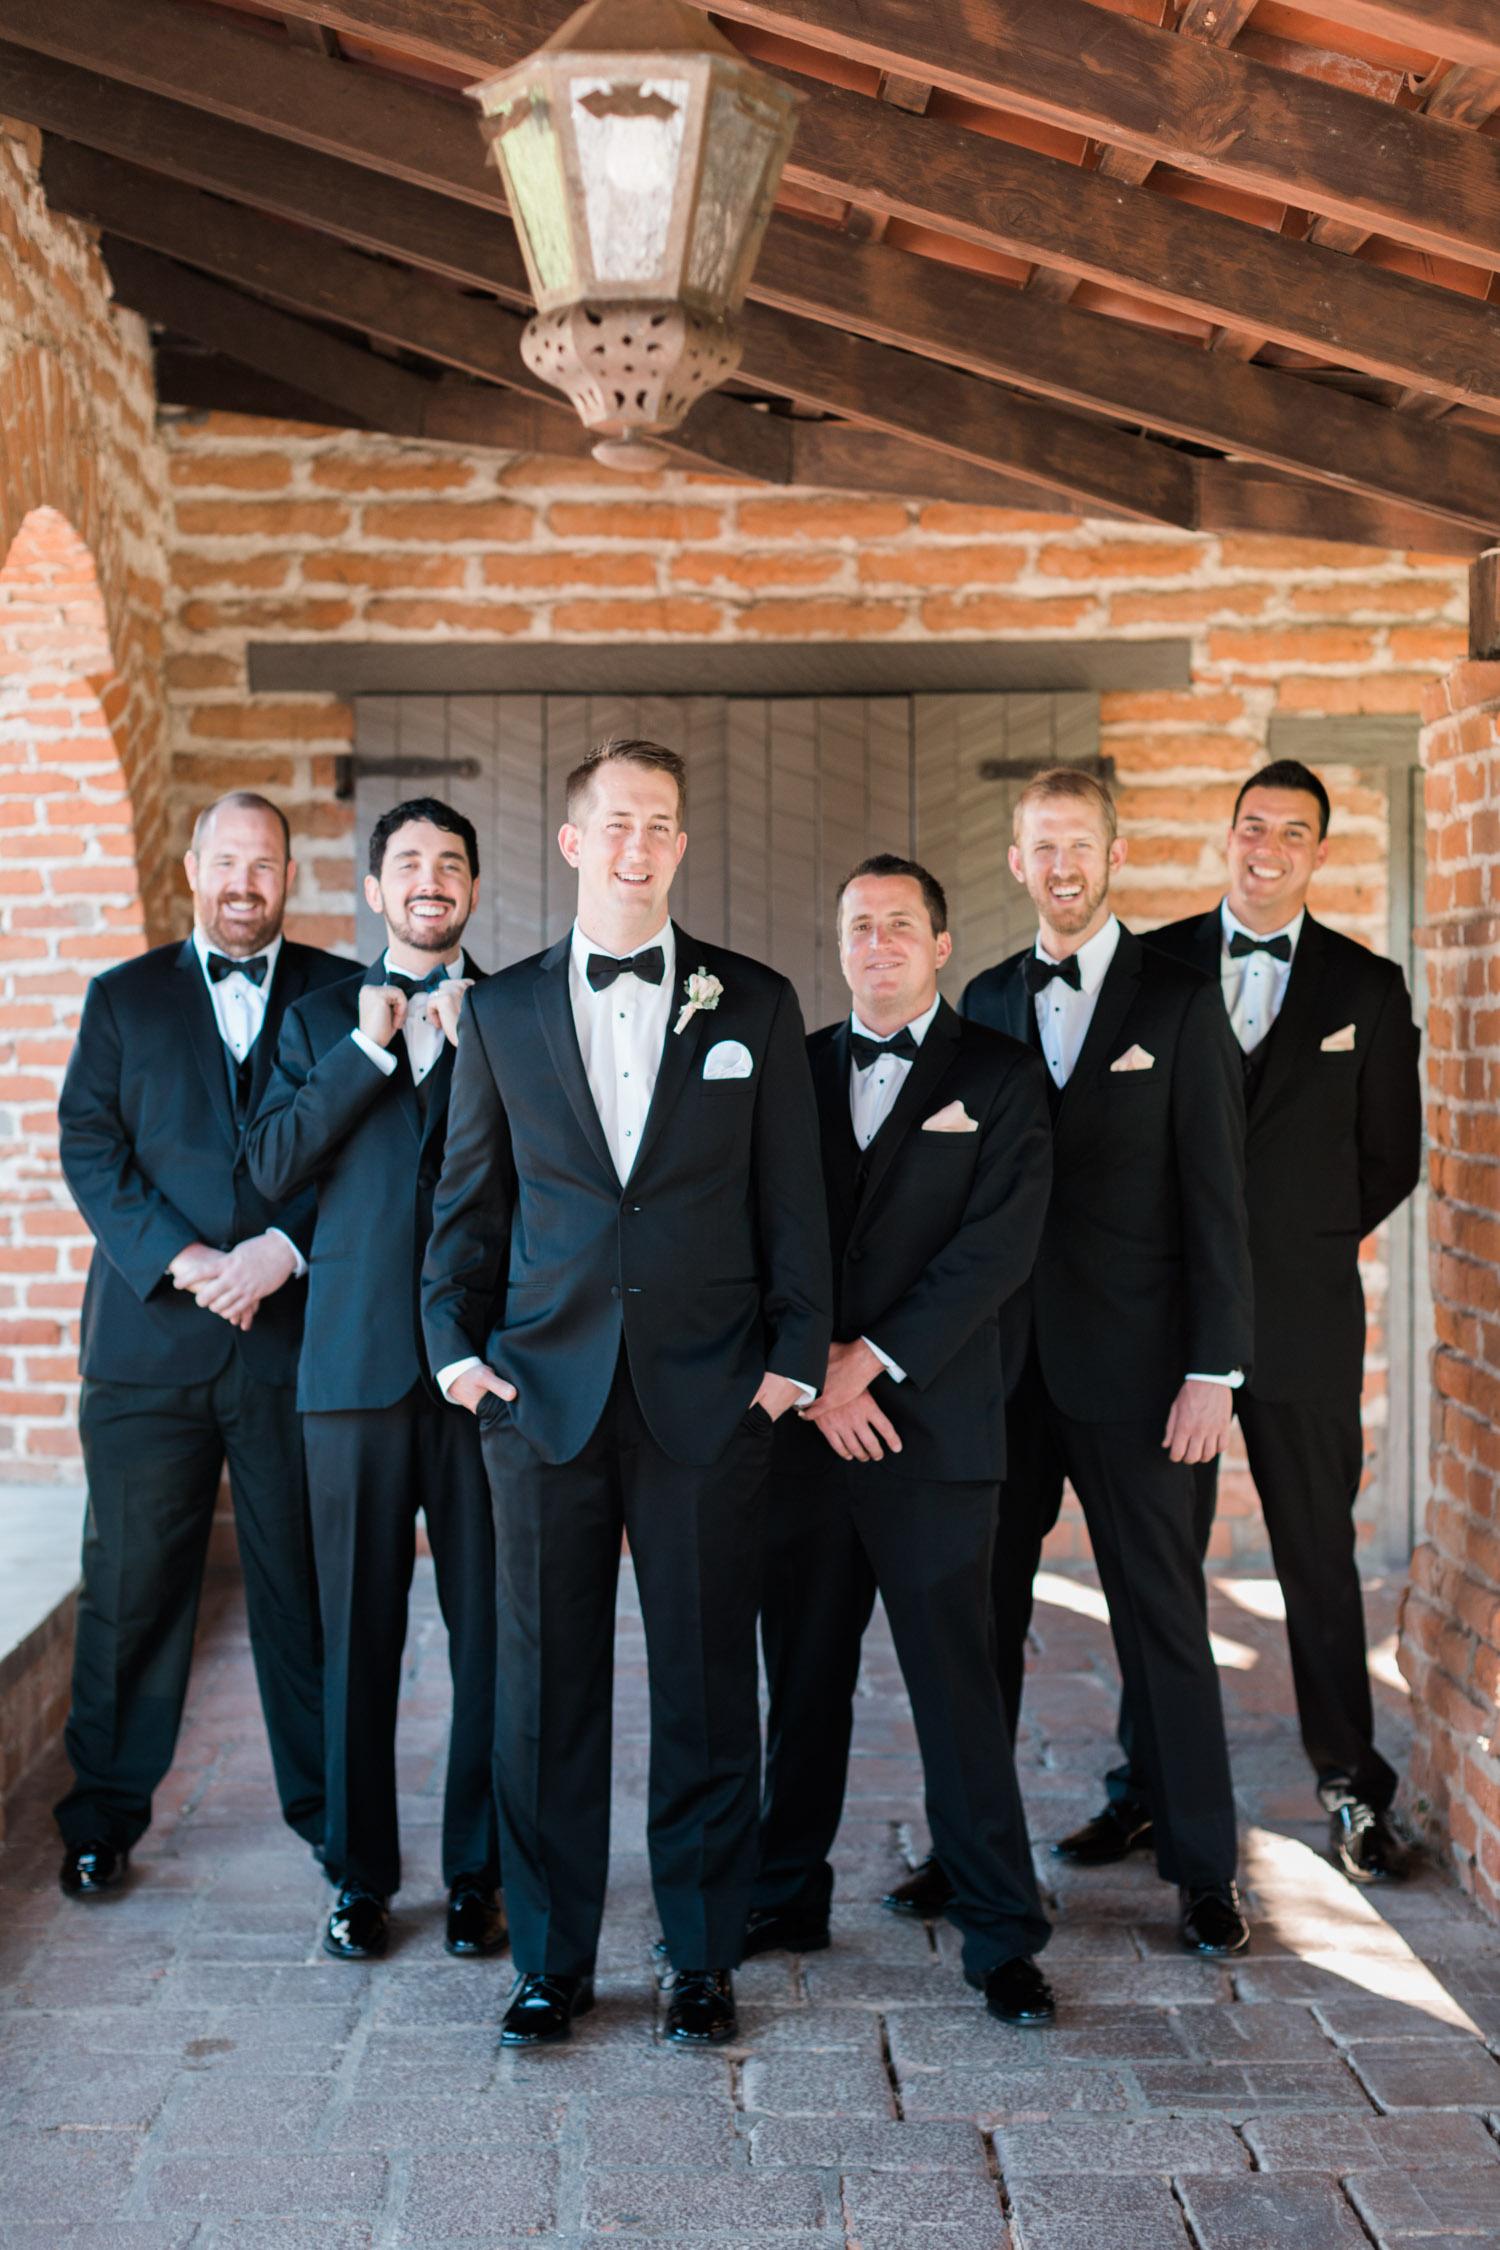 Groom with groomsmen in black tuxedos